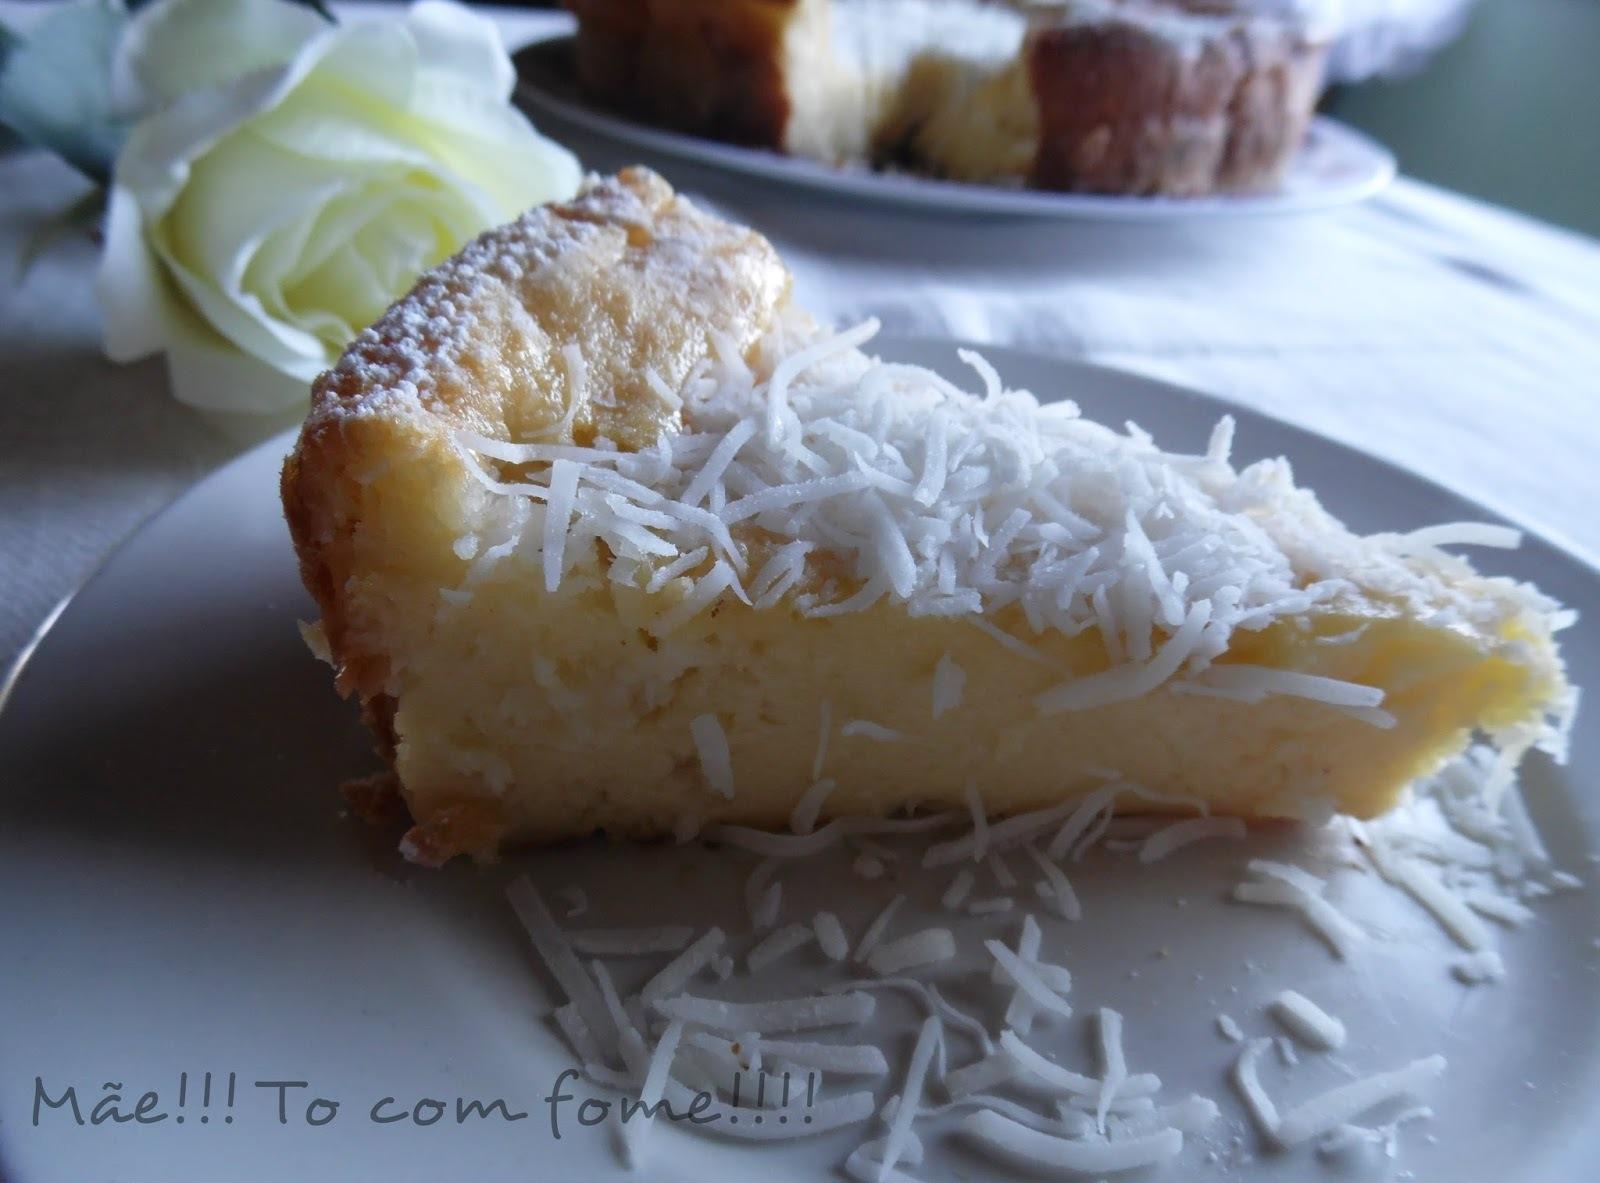 bolo de mandioca de liquidificador com leite condensado e queijo ralado